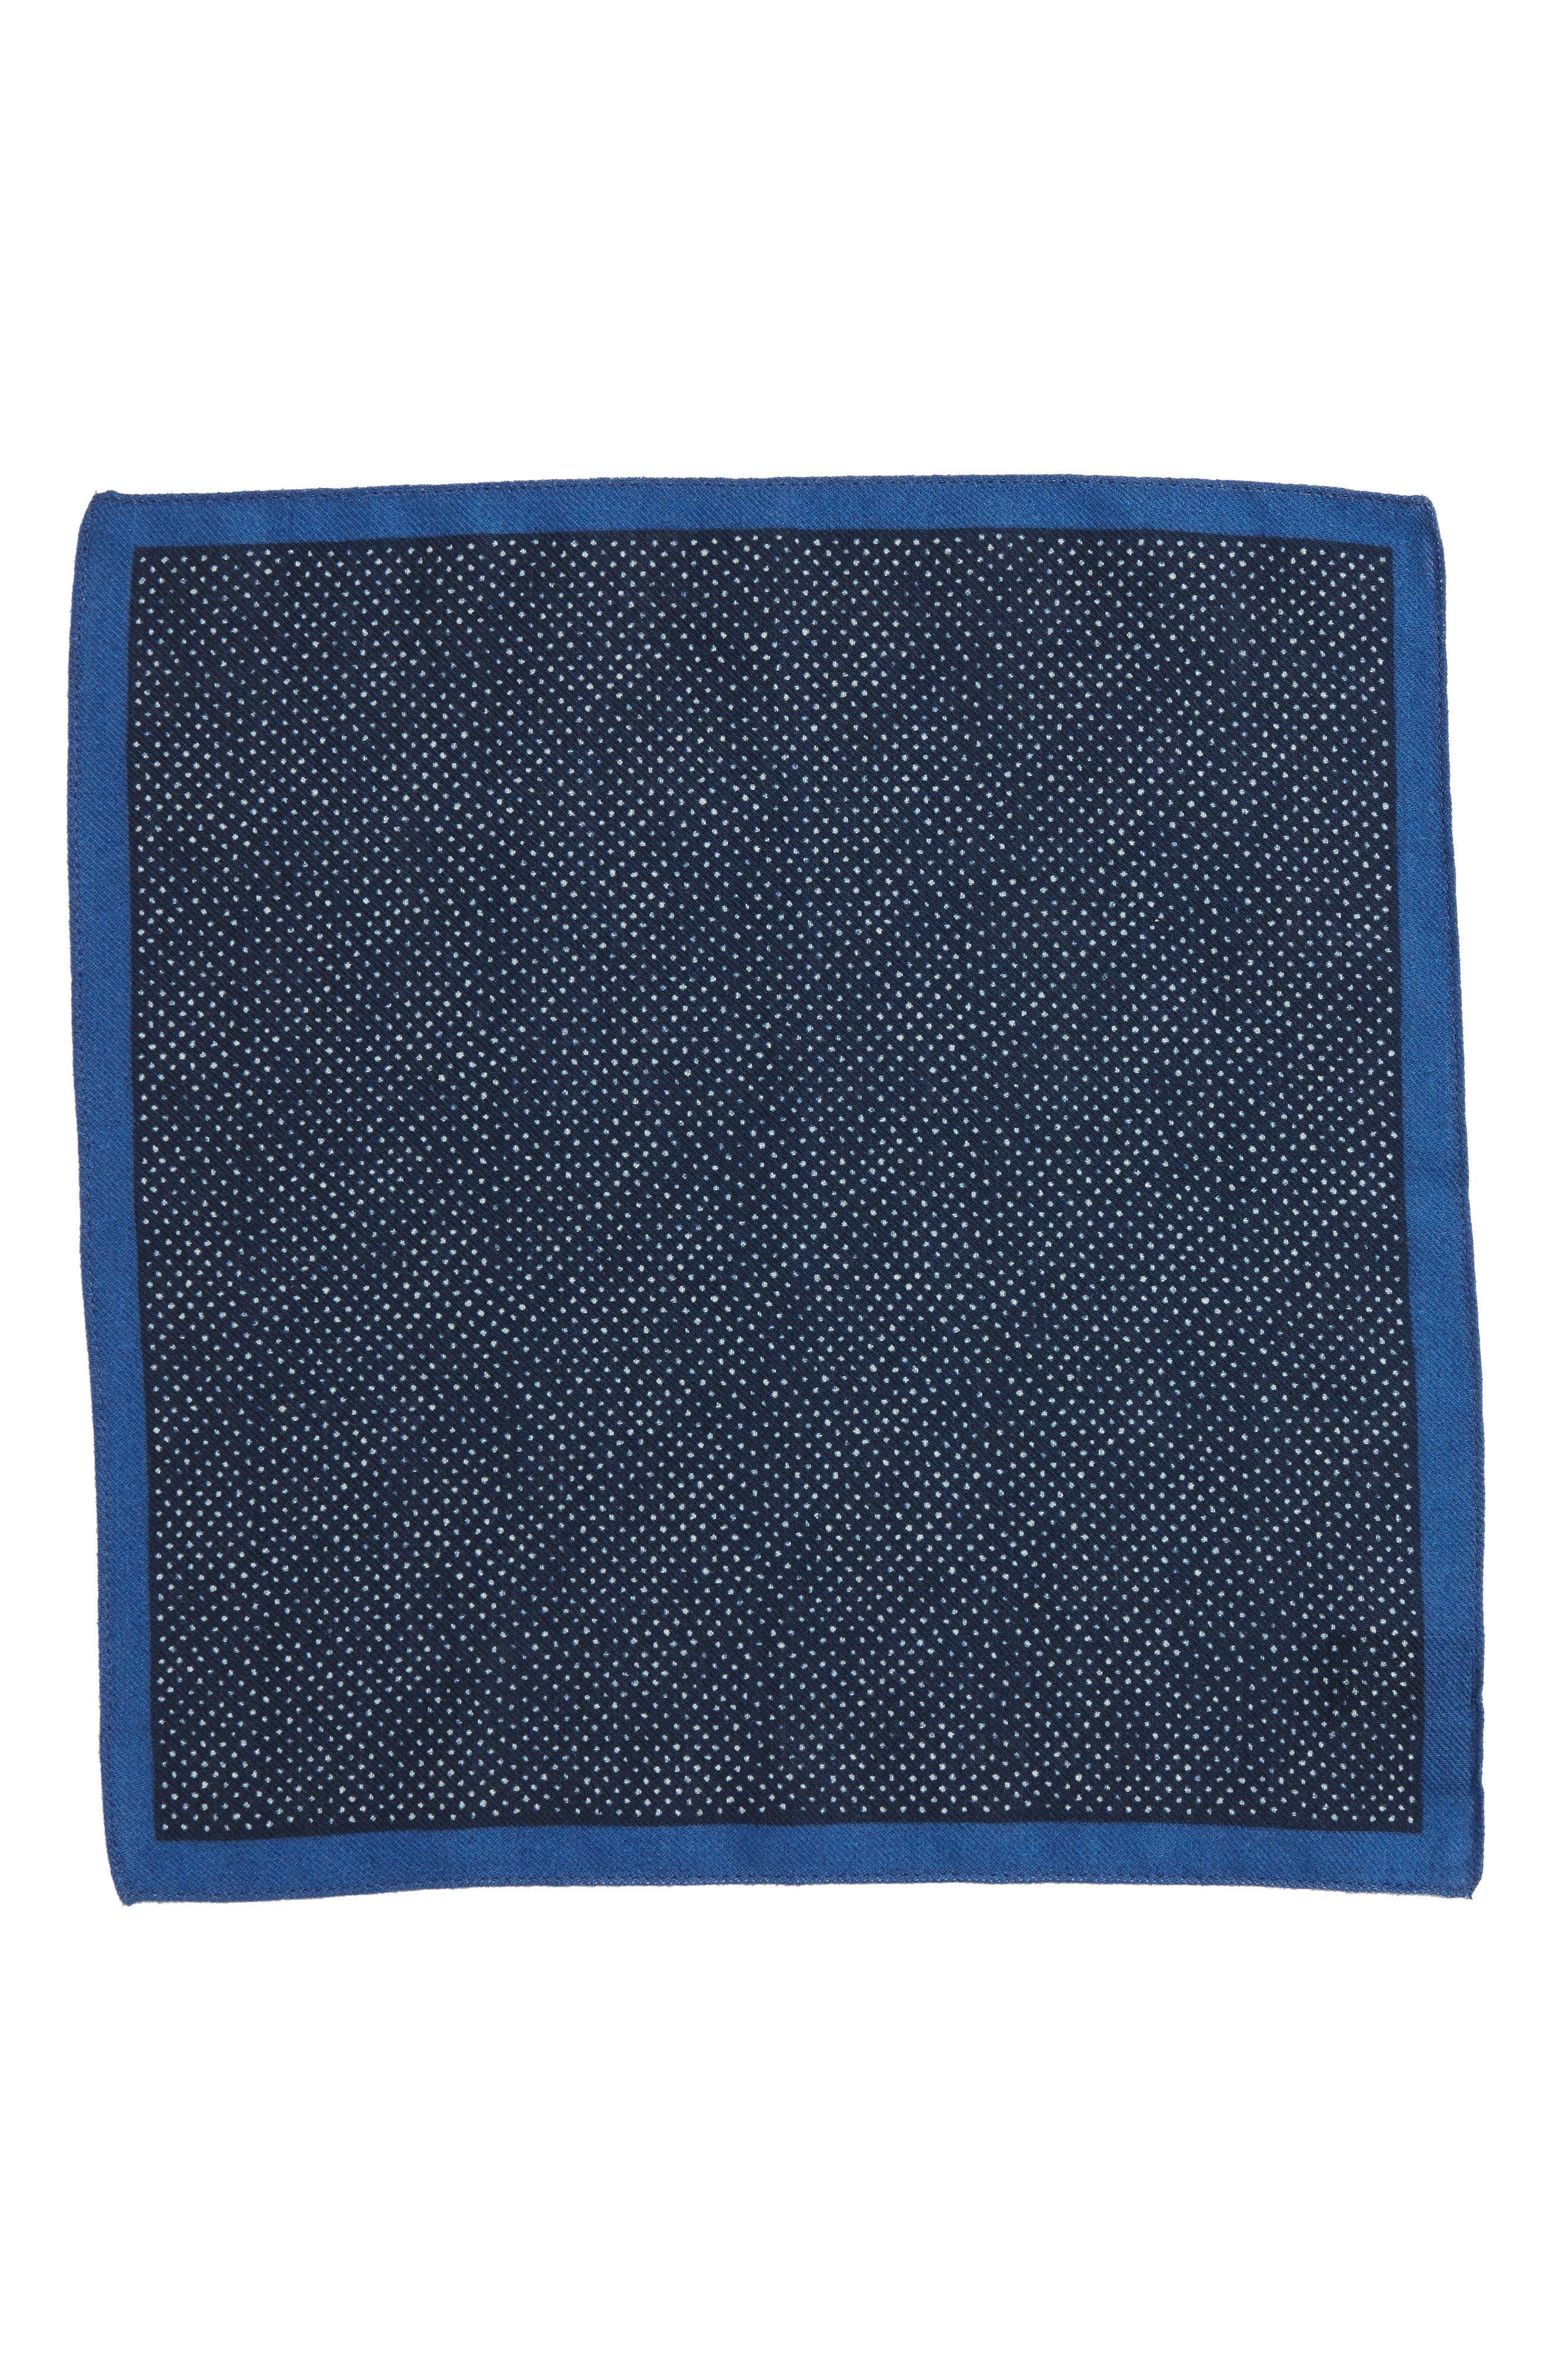 Dot Wool Pocket Square,                             Alternate thumbnail 2, color,                             411